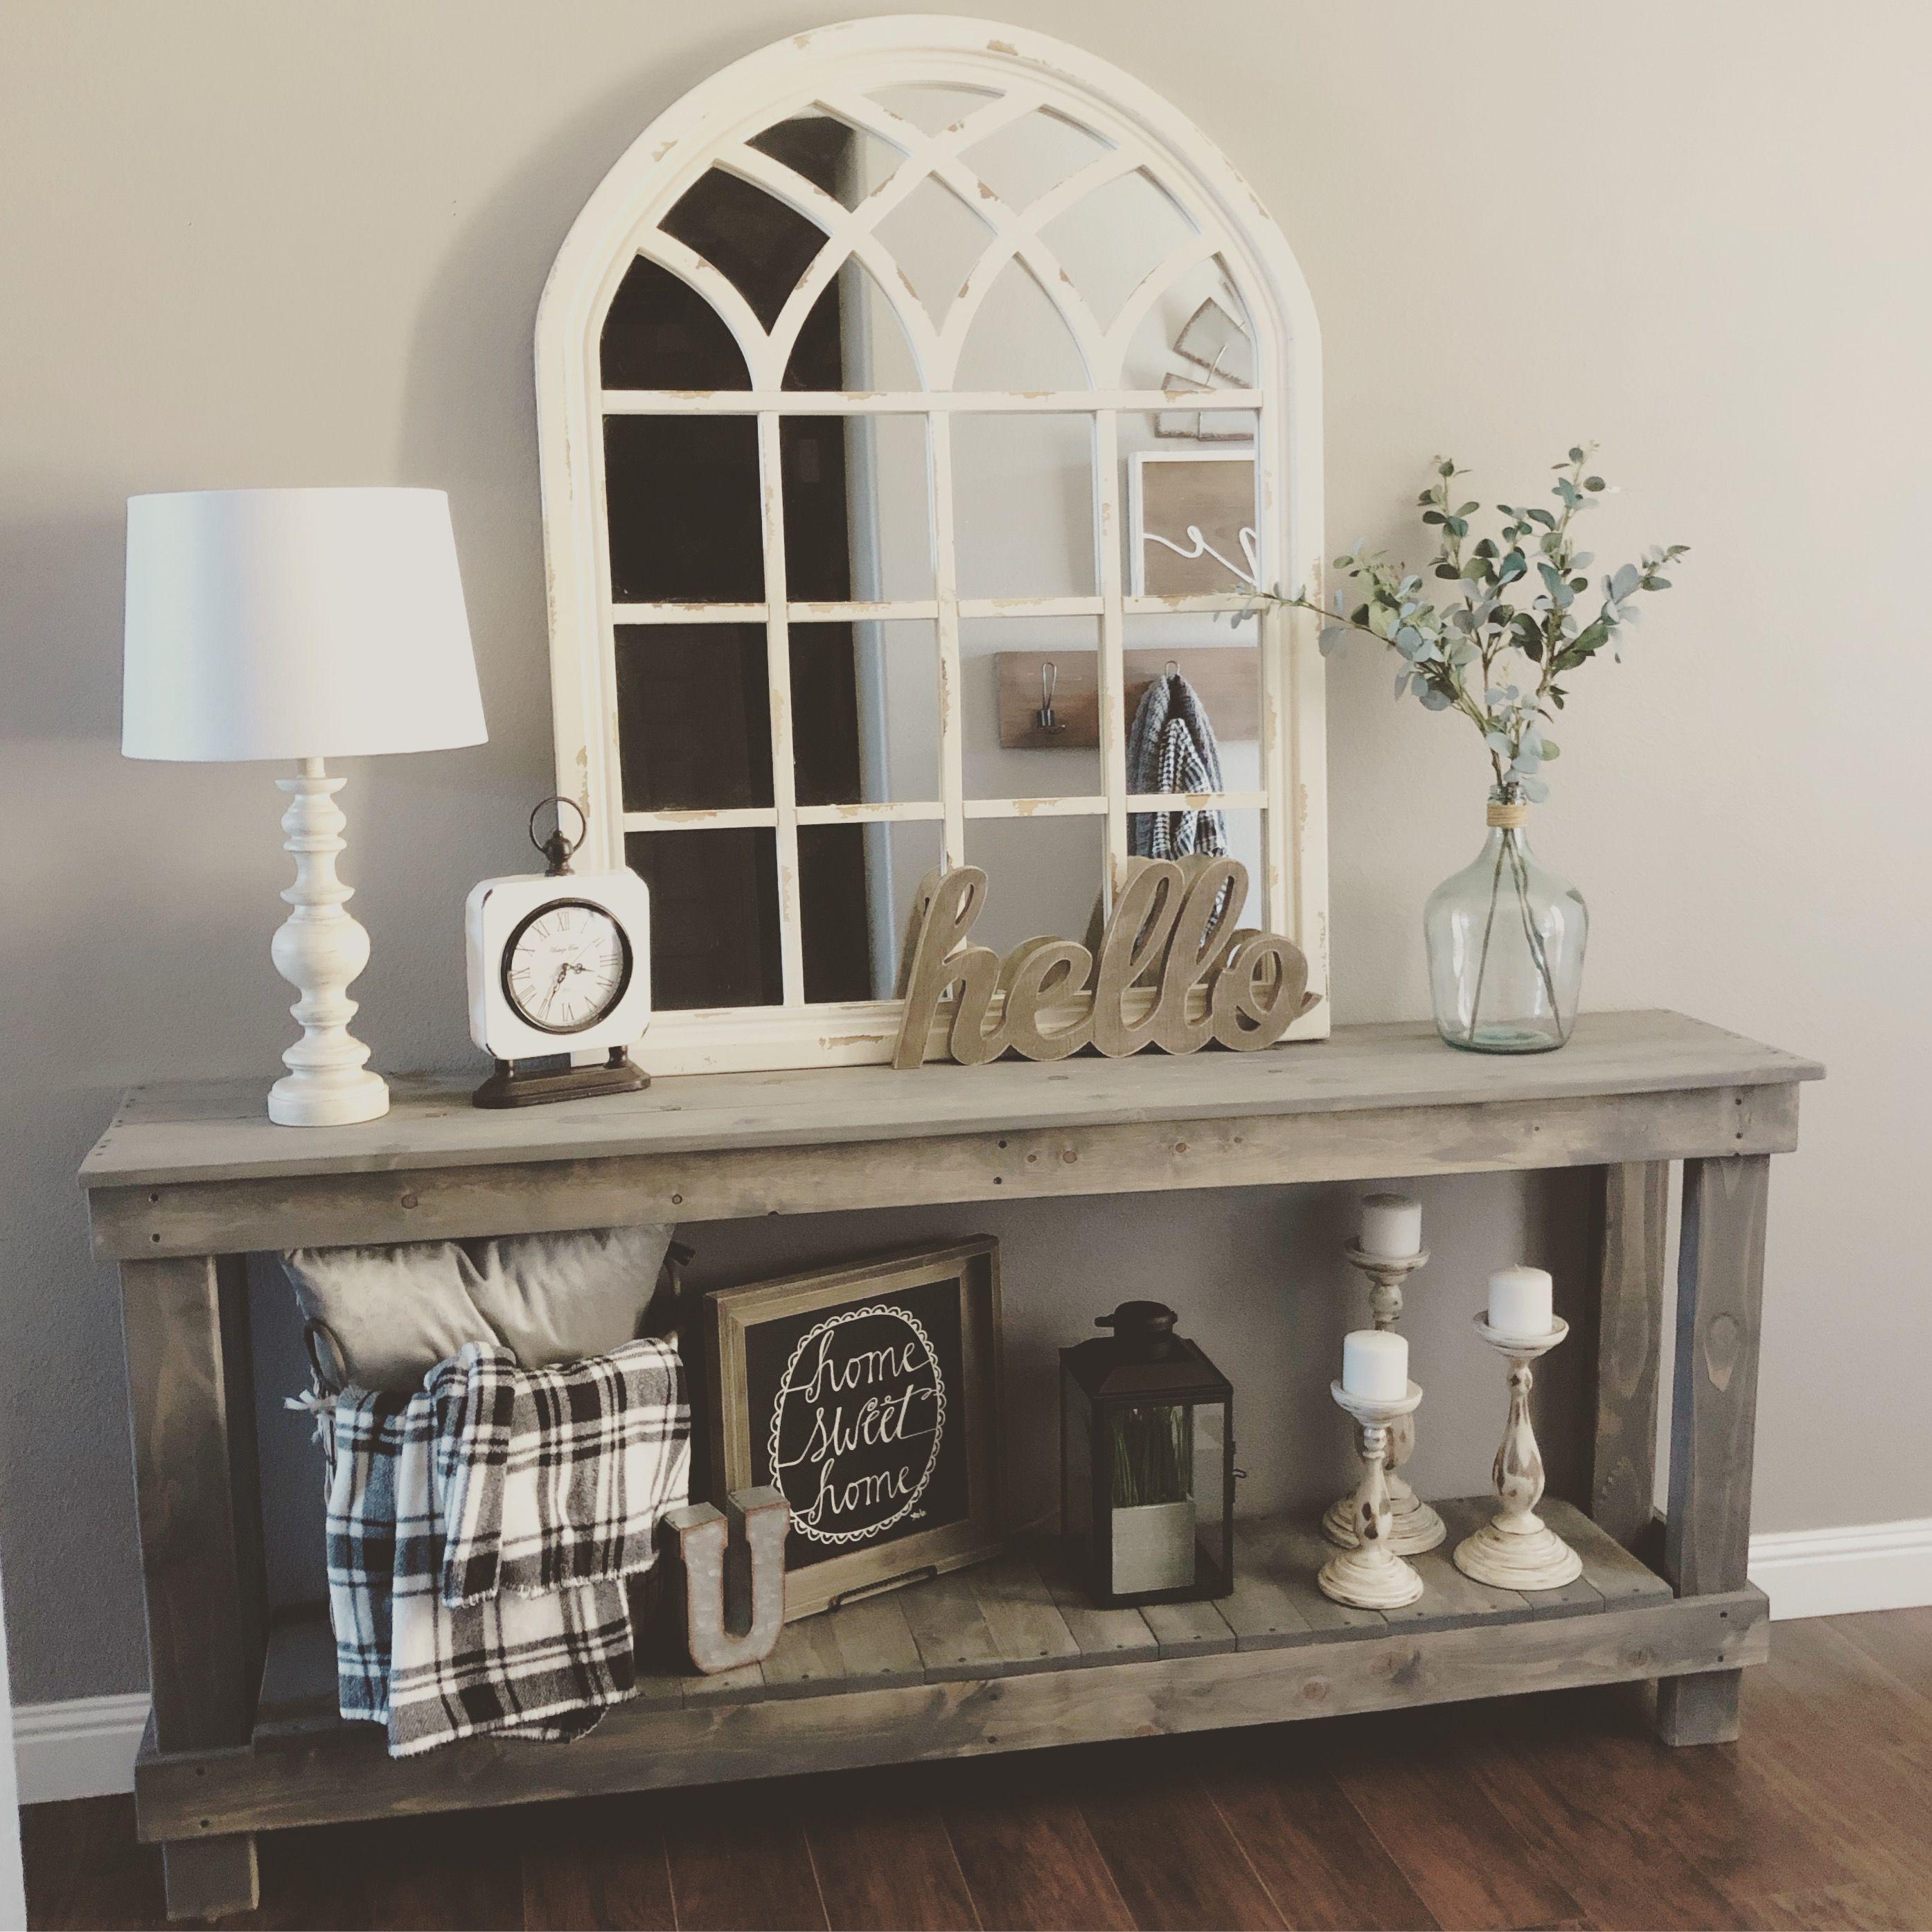 DIY console table farmhouse inspired | Sofa table decor ...